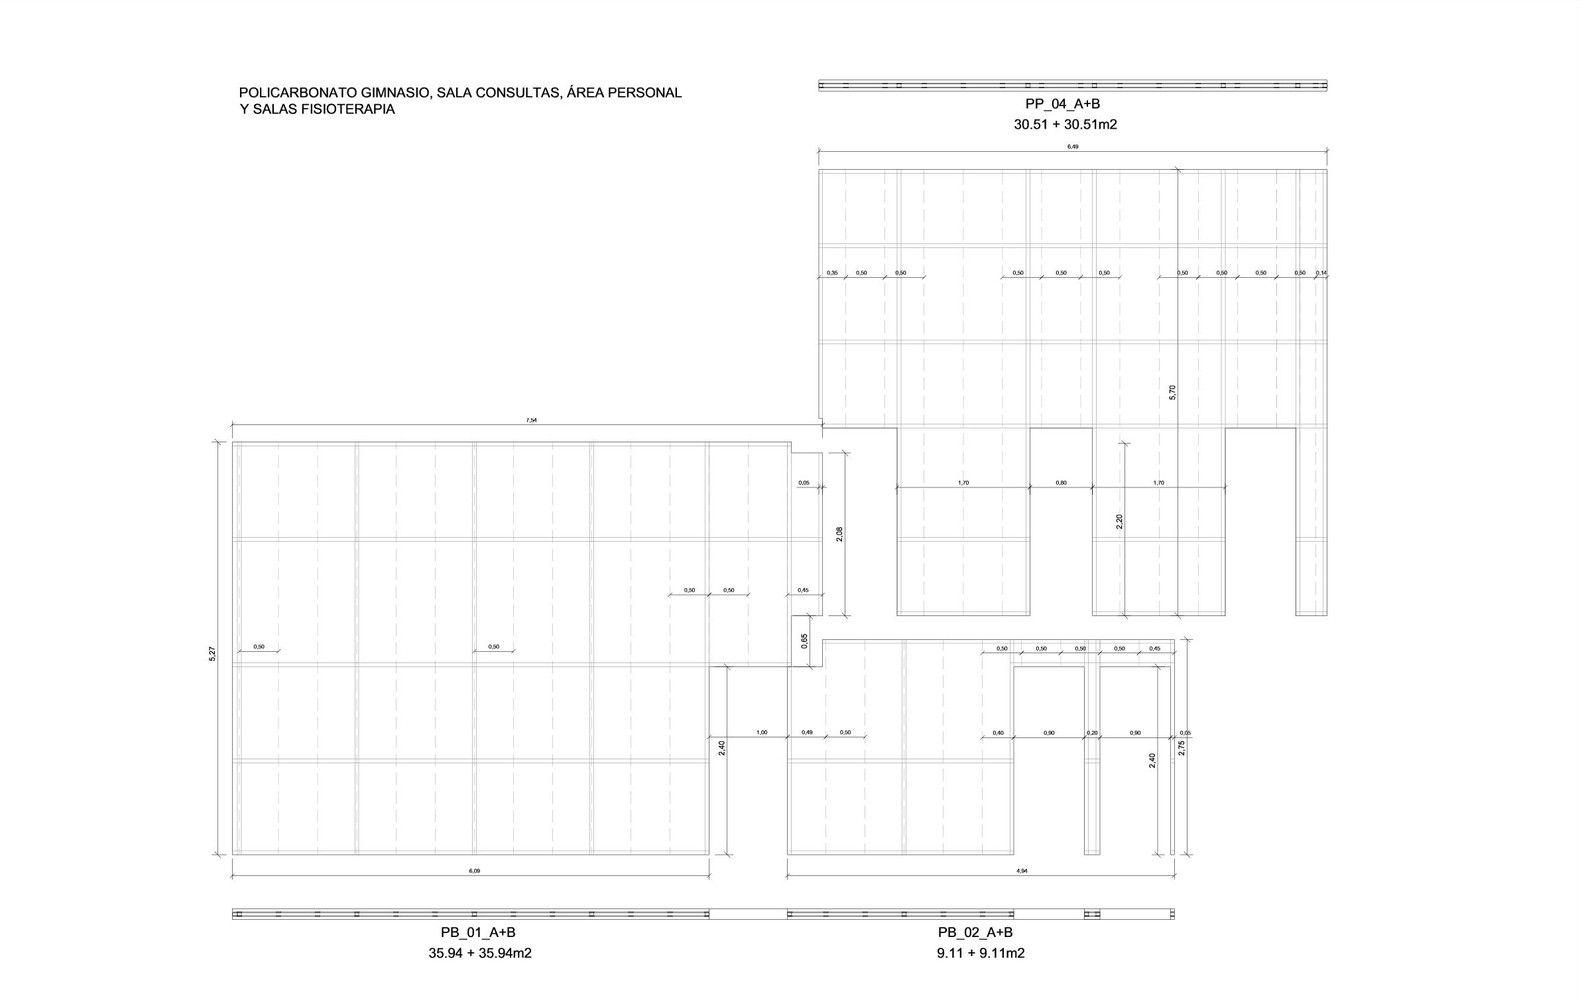 新作 | Alberich-Rodriguez Arquitectos:物理治疗诊所